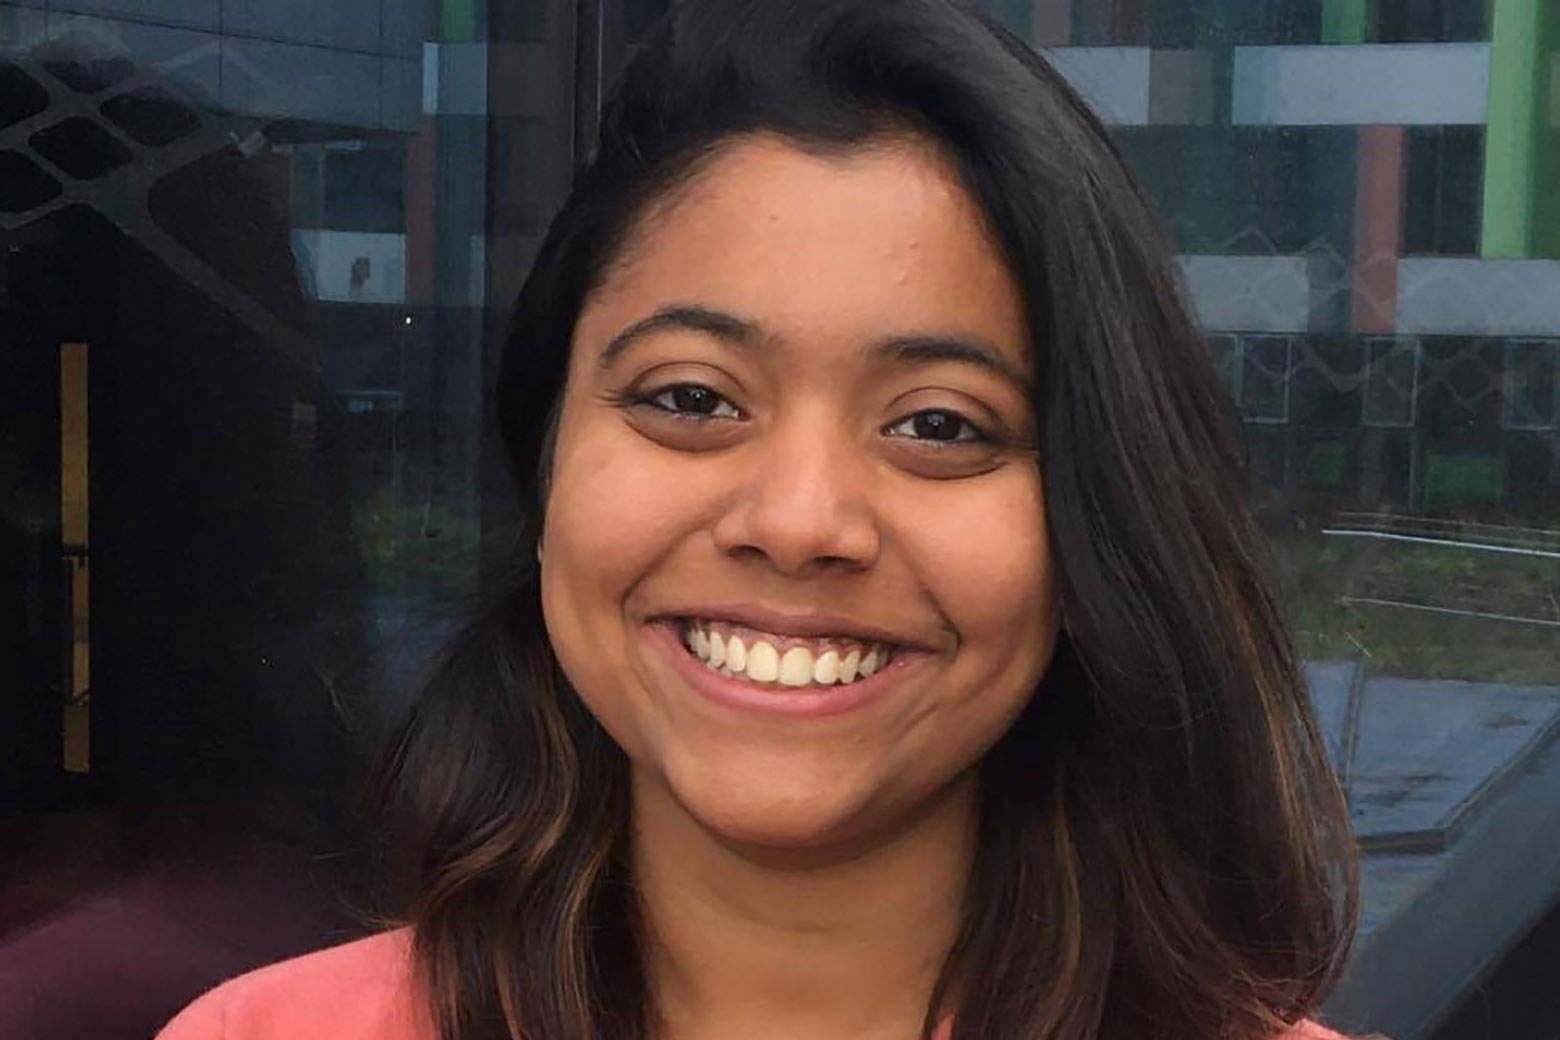 Sebina Kalawadwala